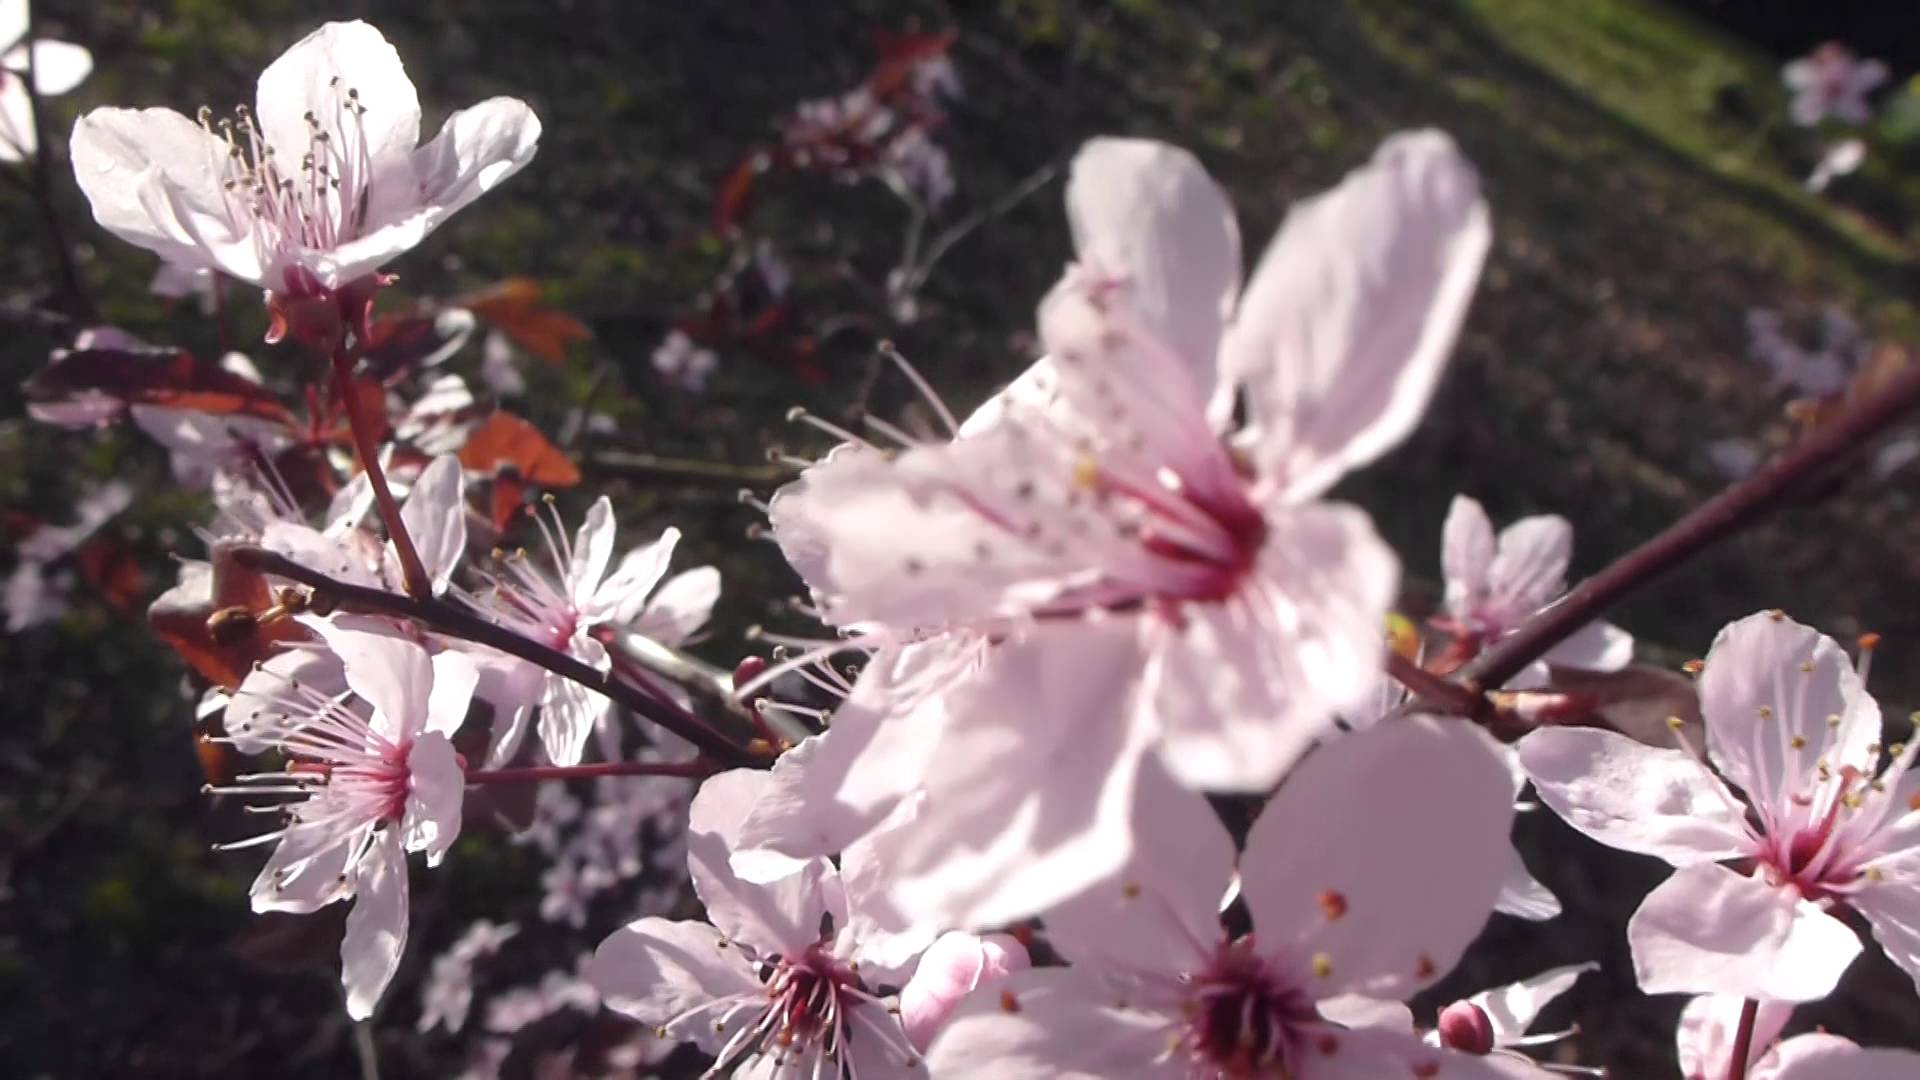 Cherry Tree blossoms - Pink Spring flowers - Kirsuberjatré - Blóm ...